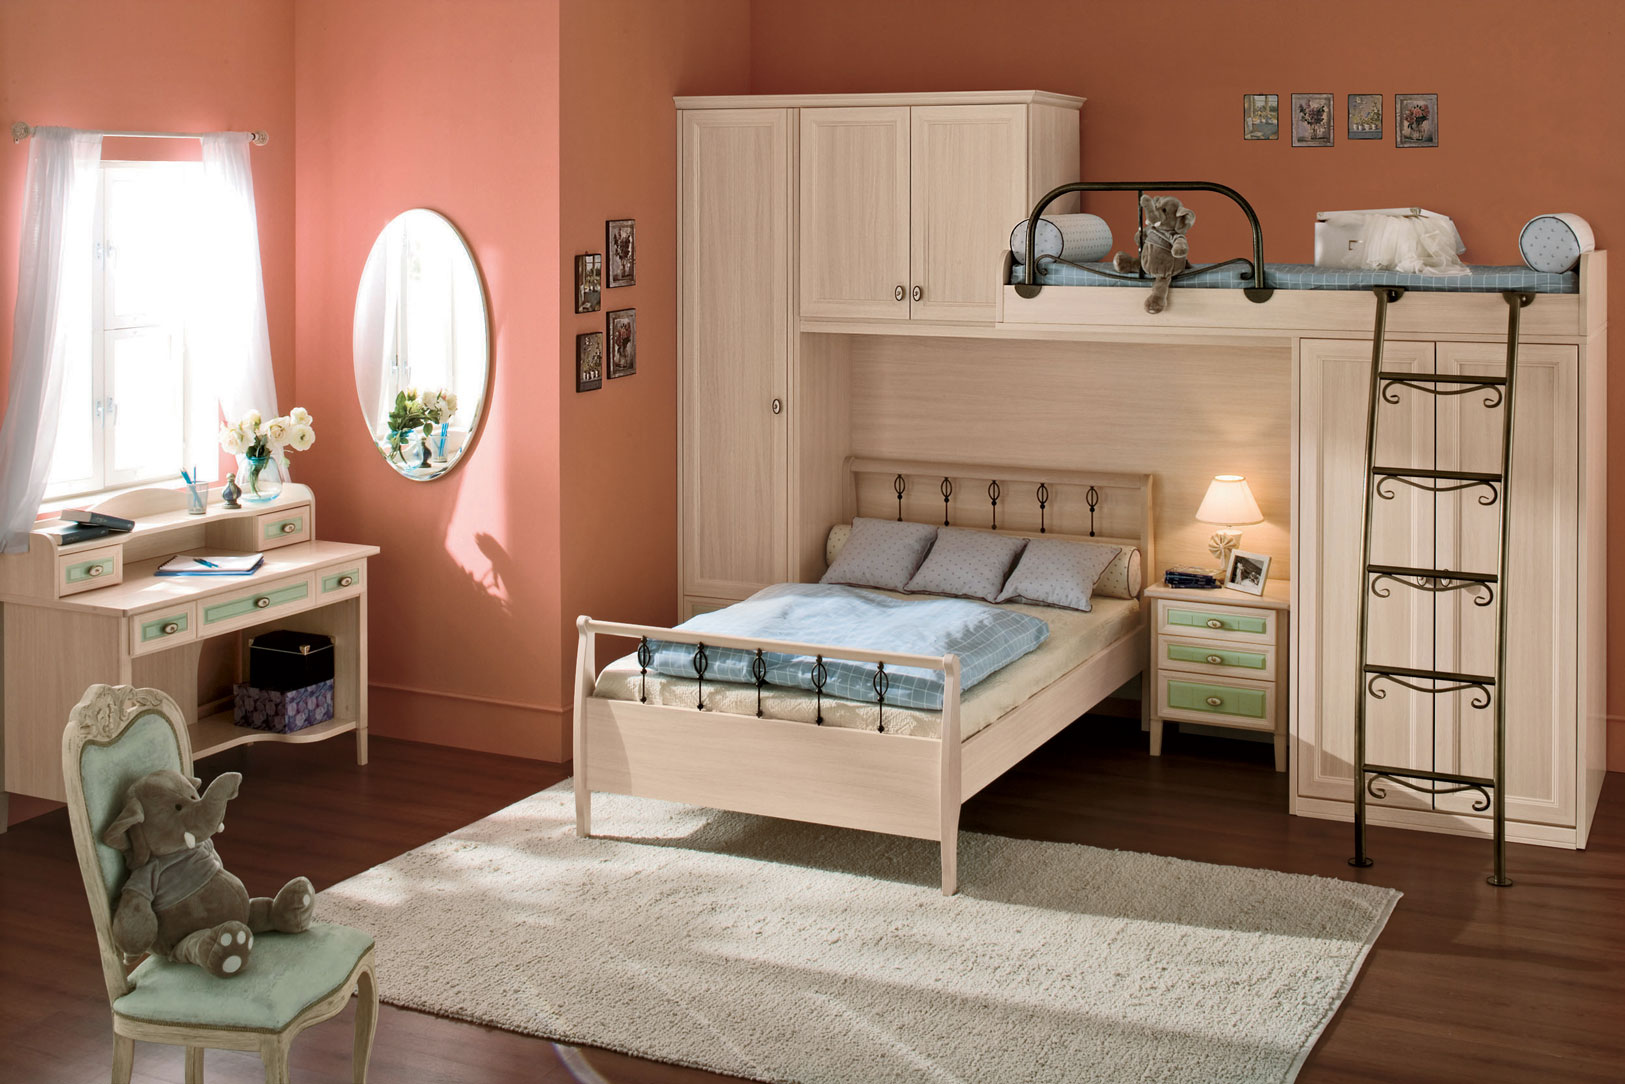 classic-kids-room